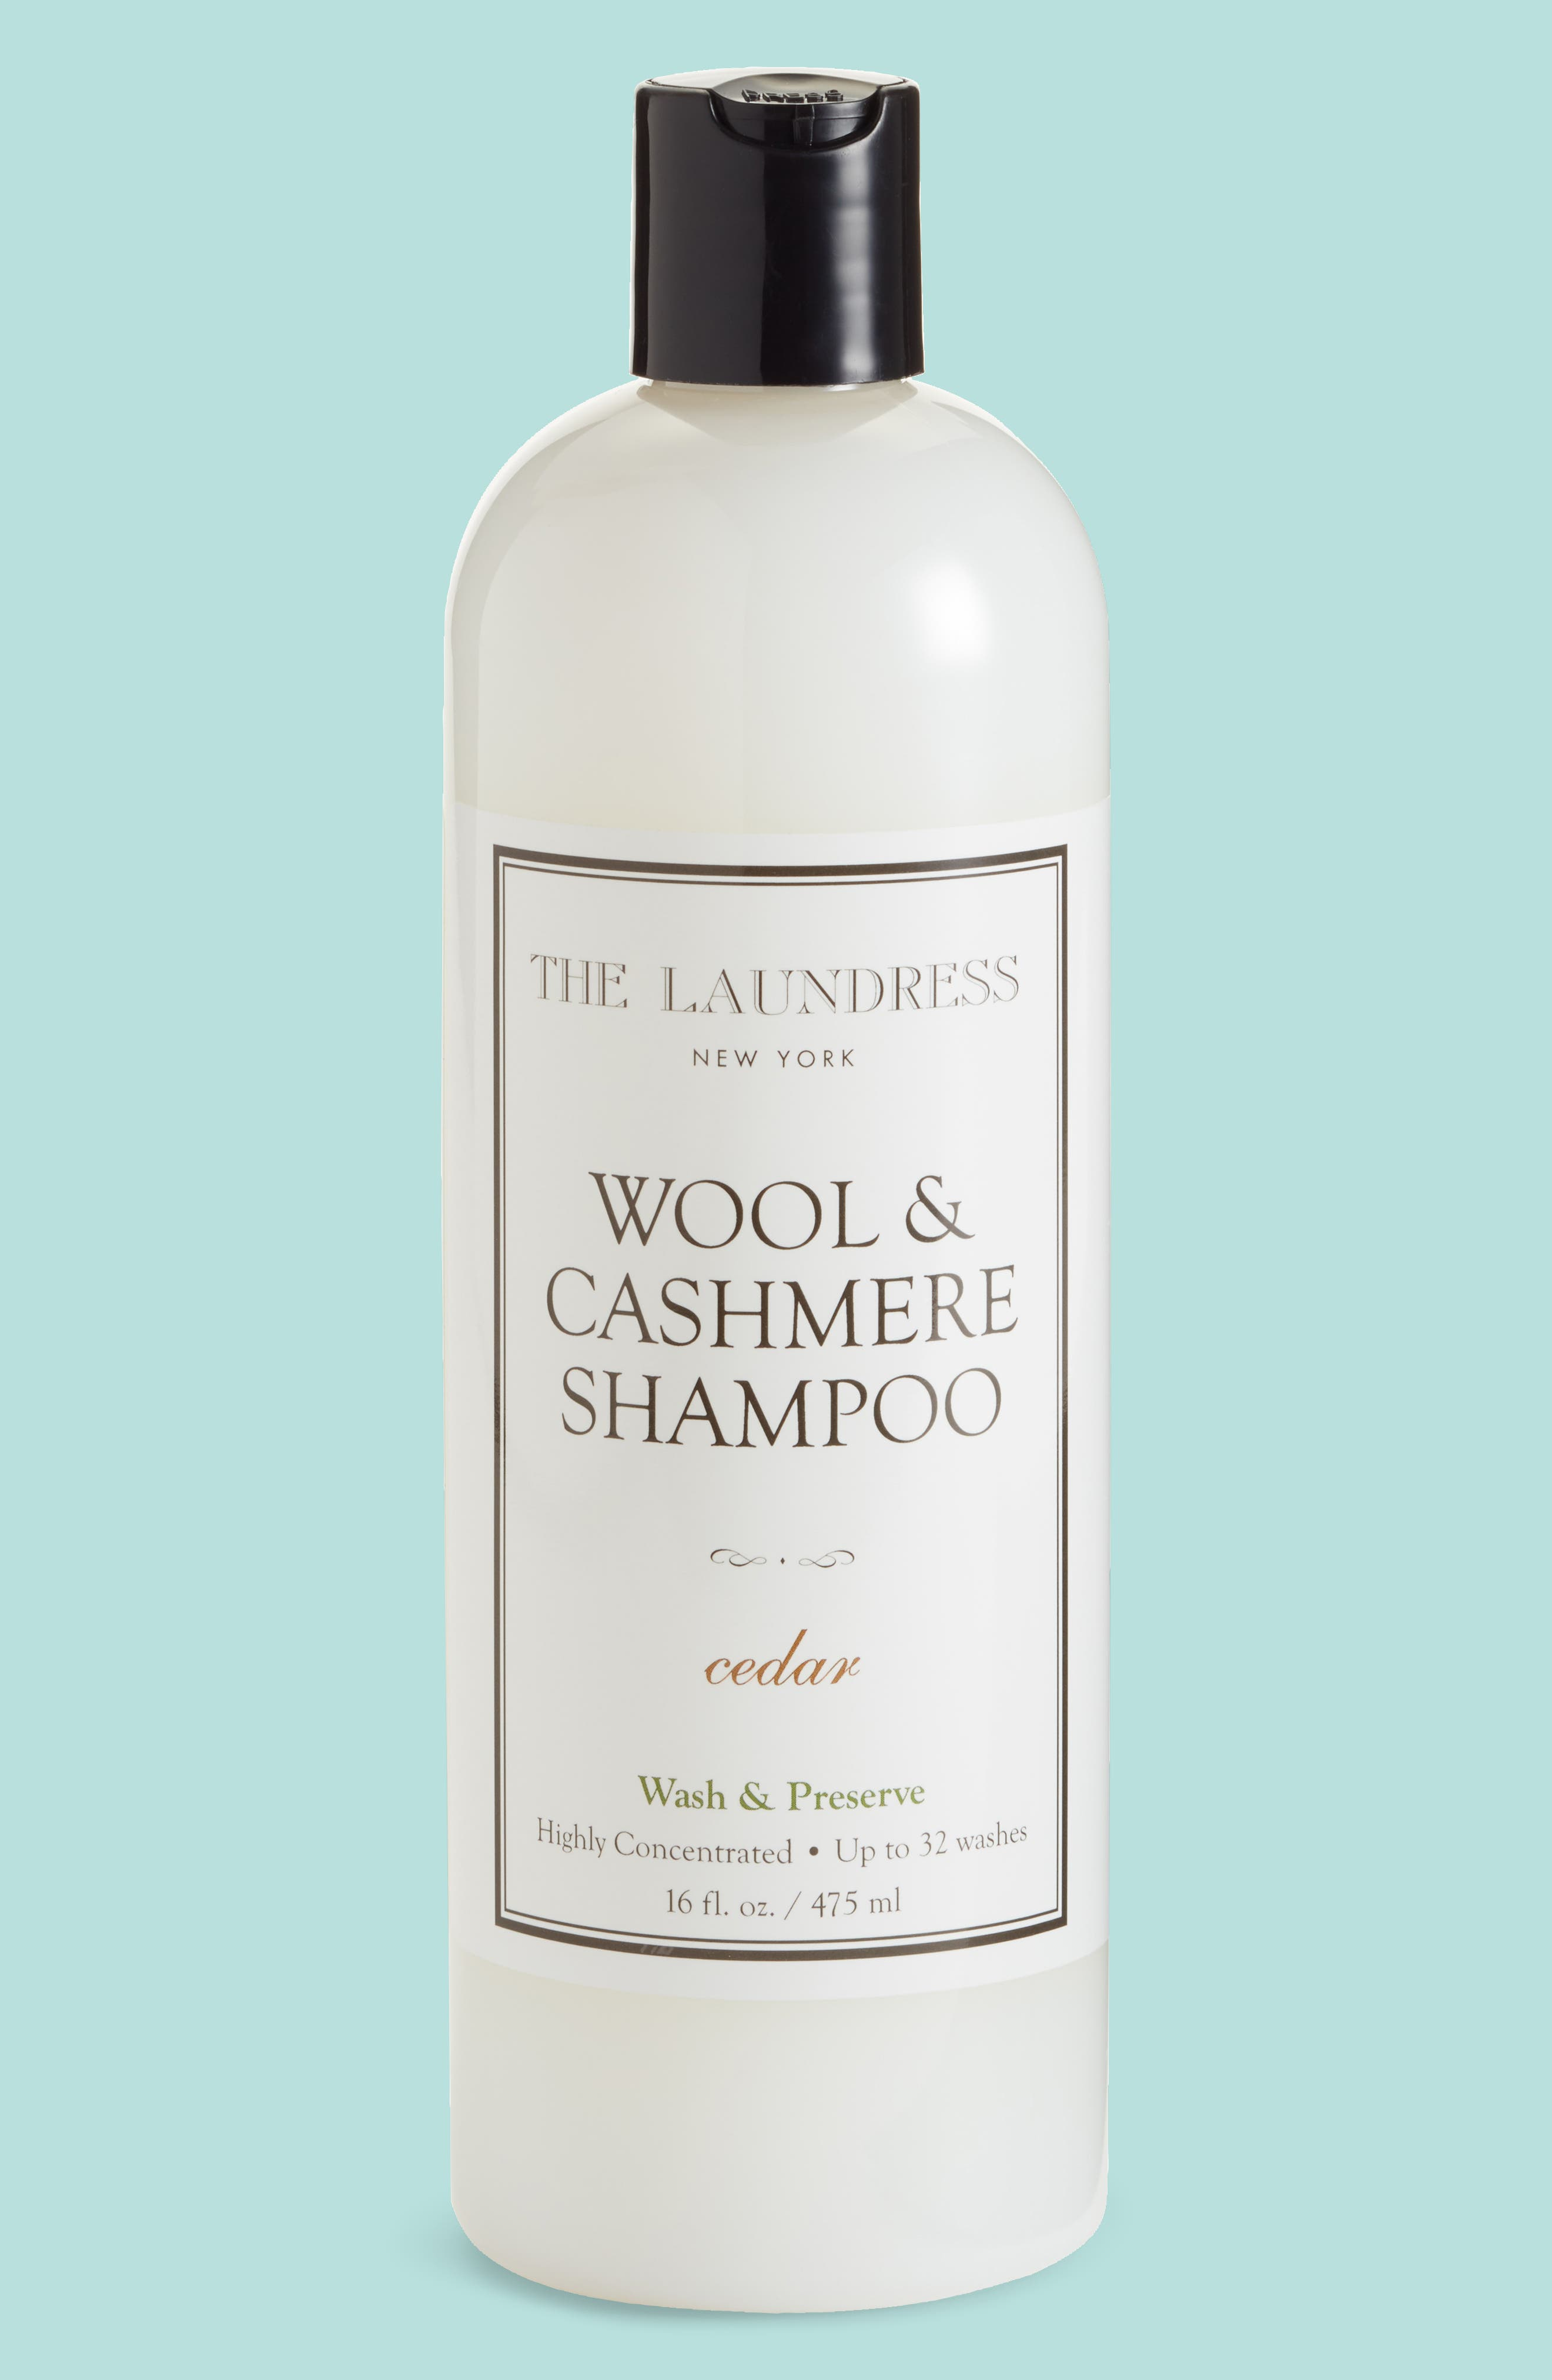 Wool & Cashmere Shampoo,                             Main thumbnail 1, color,                             Cedar